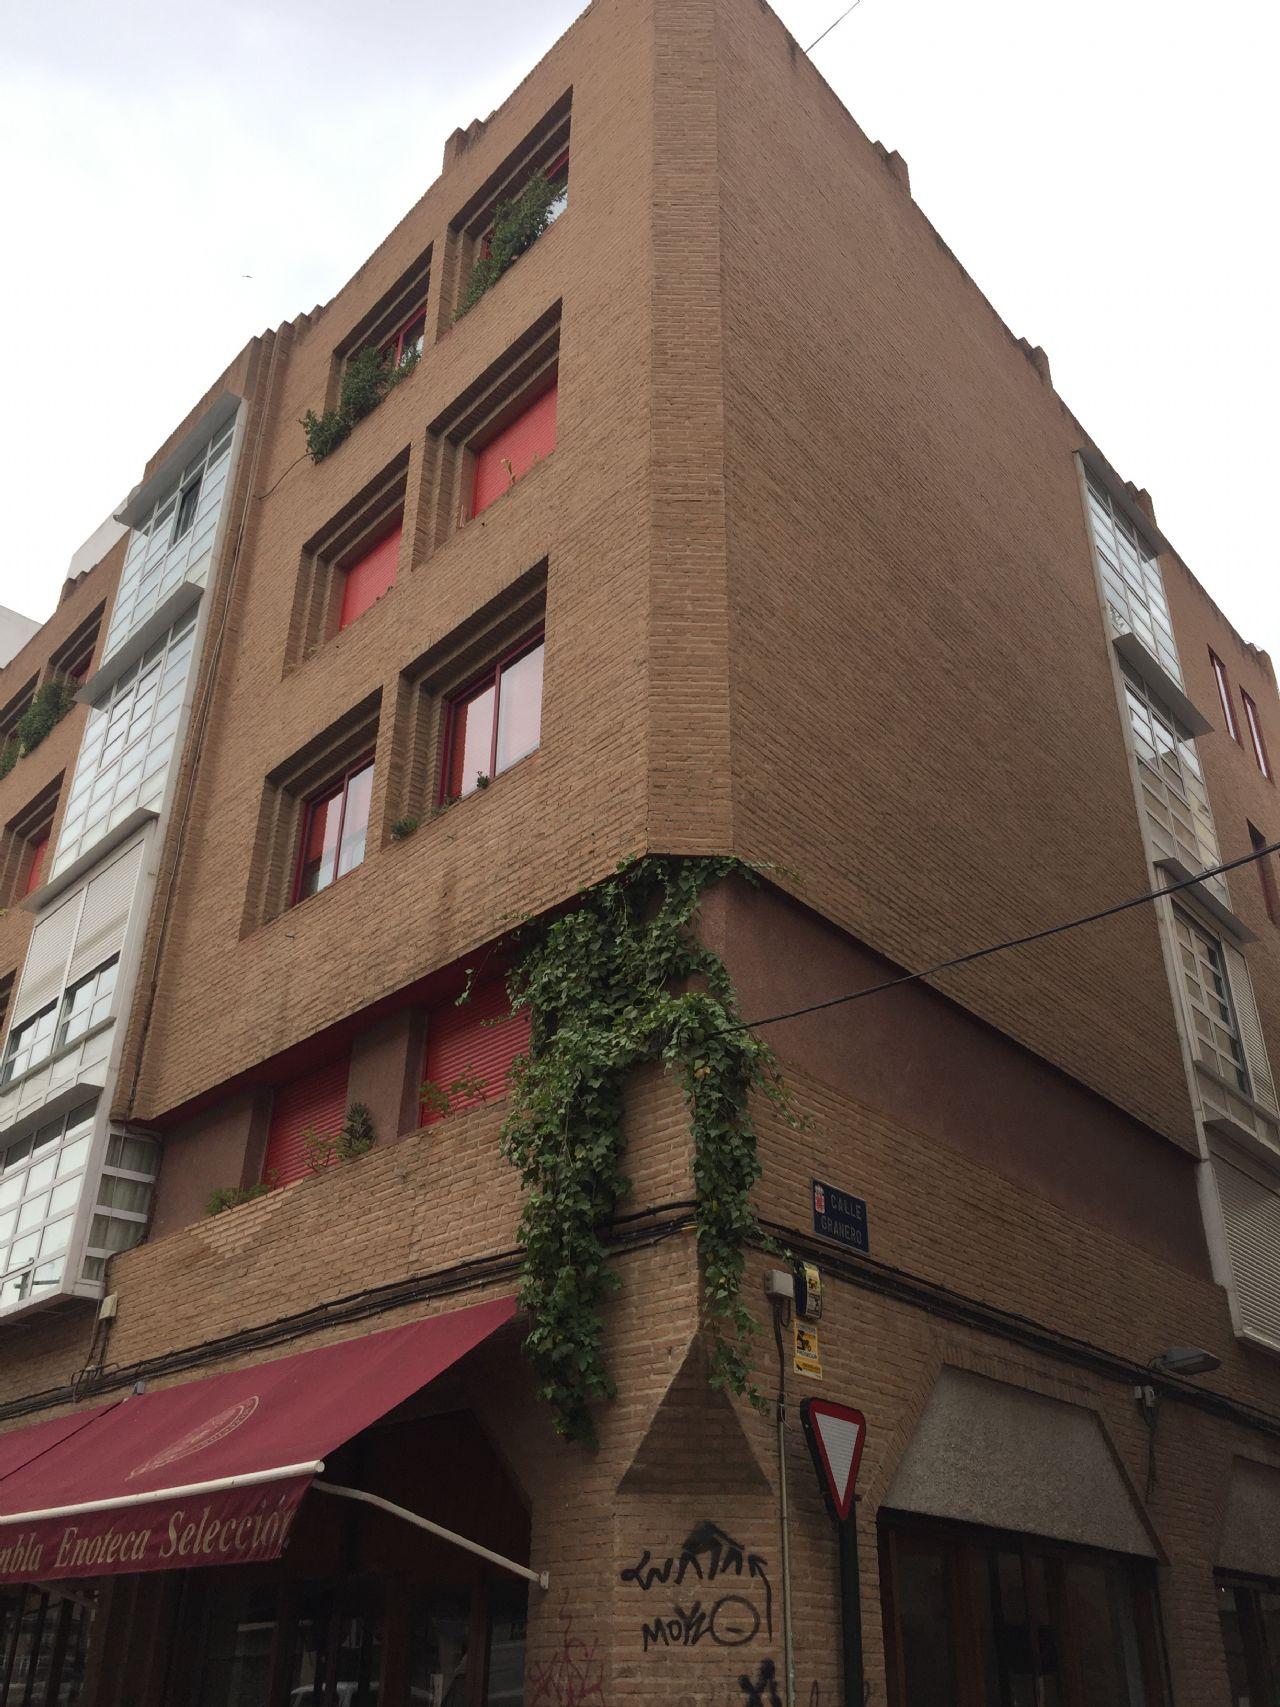 Piso en Murcia, SAN LORENZO, venta